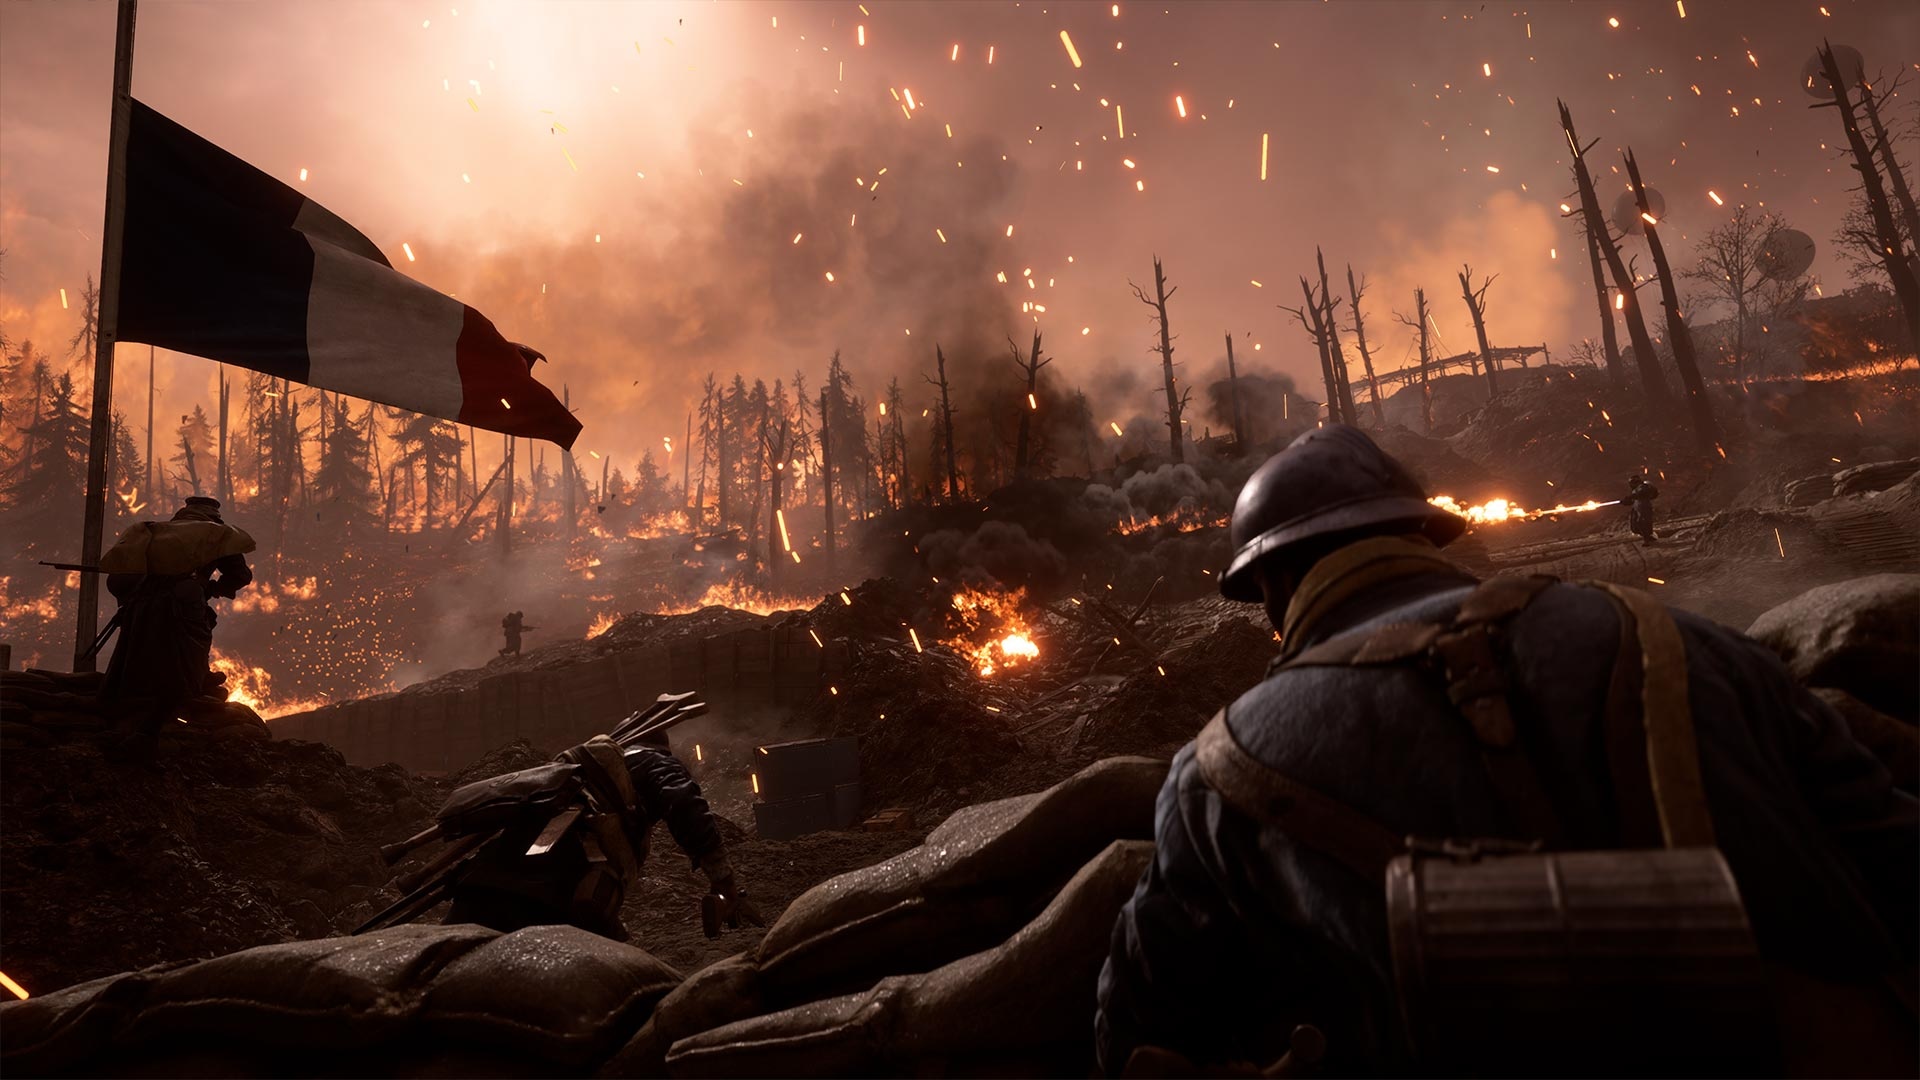 https://media-www-battlefieldwebcore.spark.ea.com/content/battlefield-portal/fr_FR/games/battlefield-1/they-shall-not-pass/_jcr_content/par/section_6/columns/column/content/editorial_0/image/large.img.jpg